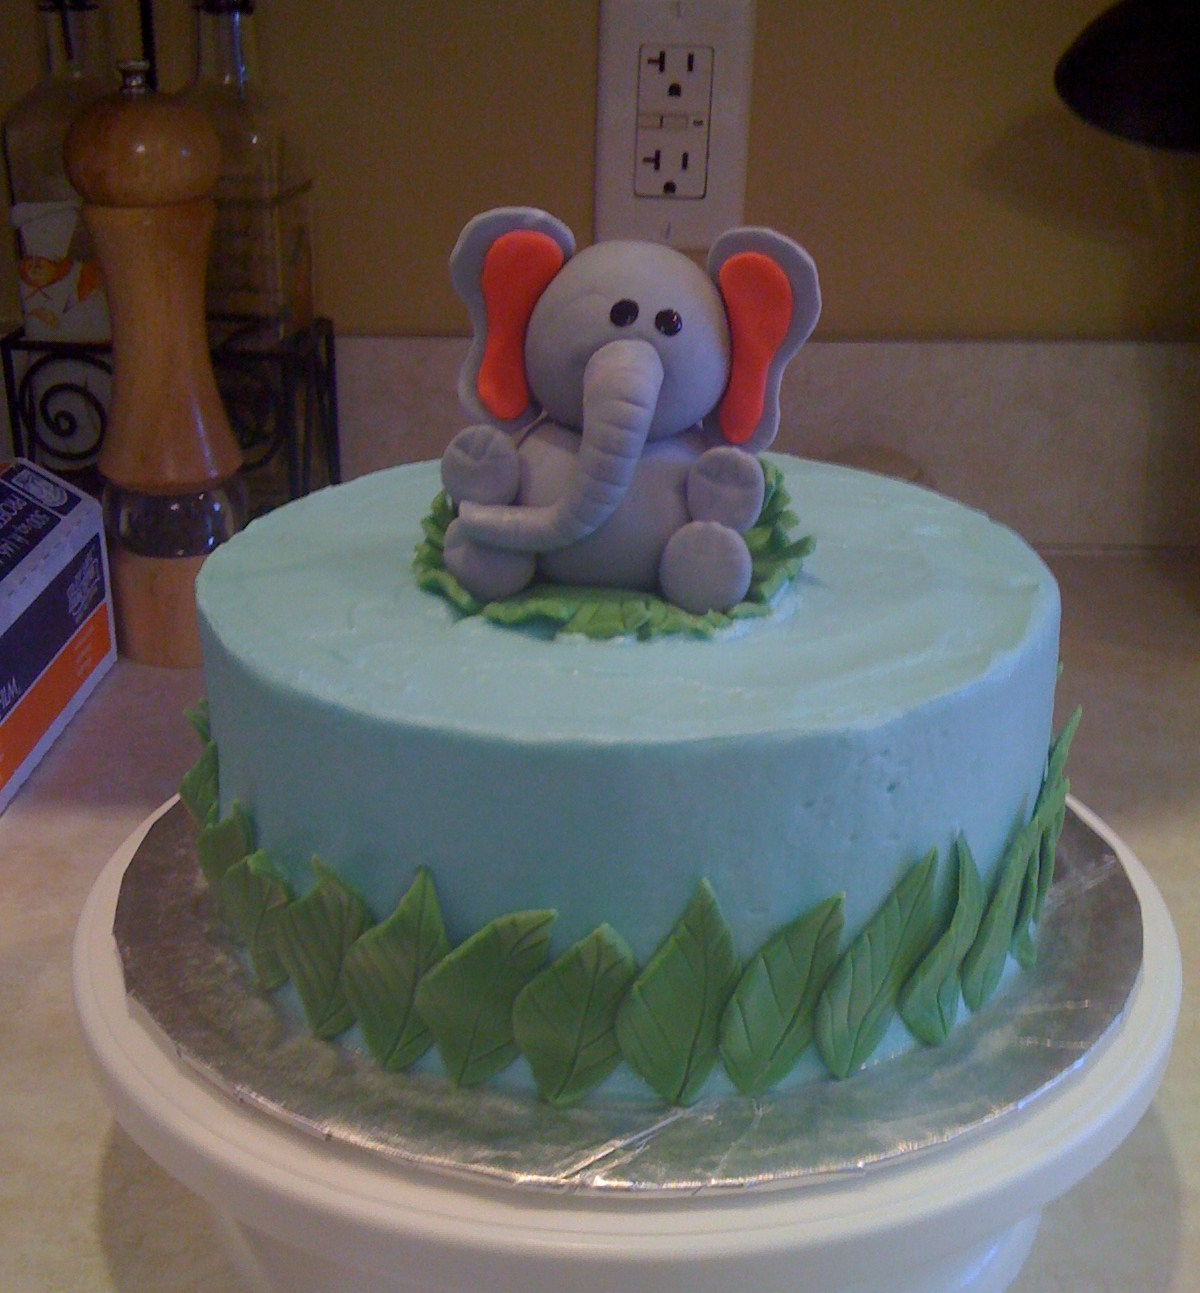 Birthday Cake Decorations For Seniors : Elephant Cakes   Decoration Ideas Little Birthday Cakes